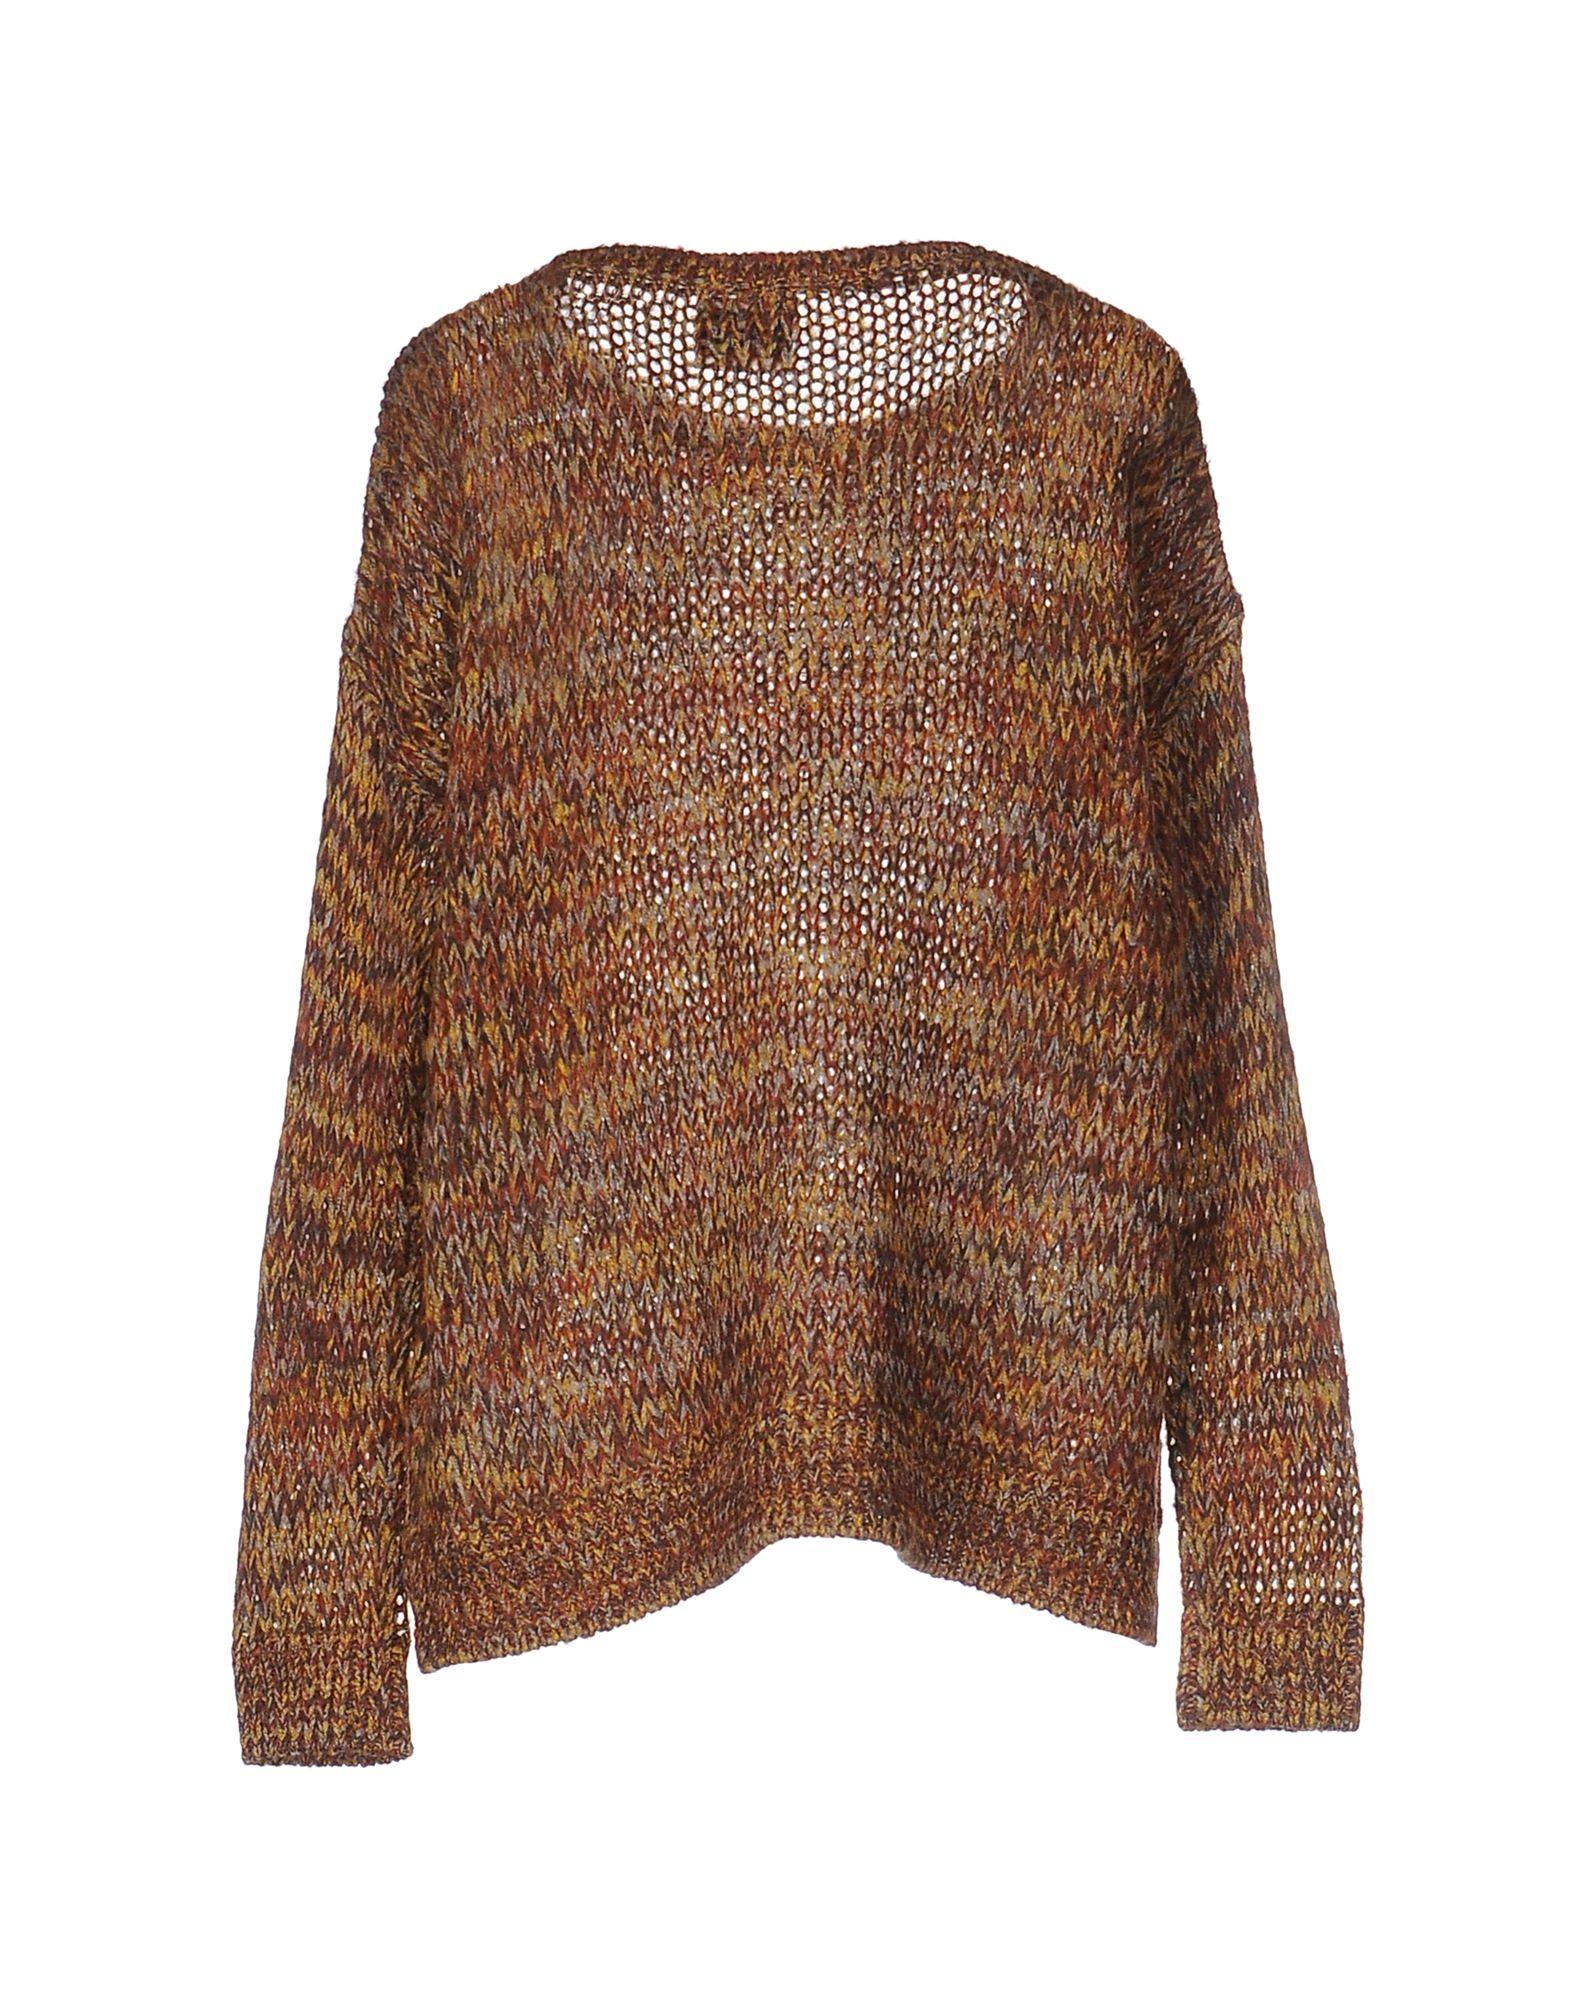 Vero Moda Knitting Patterns : Vero moda sweater in brown lyst